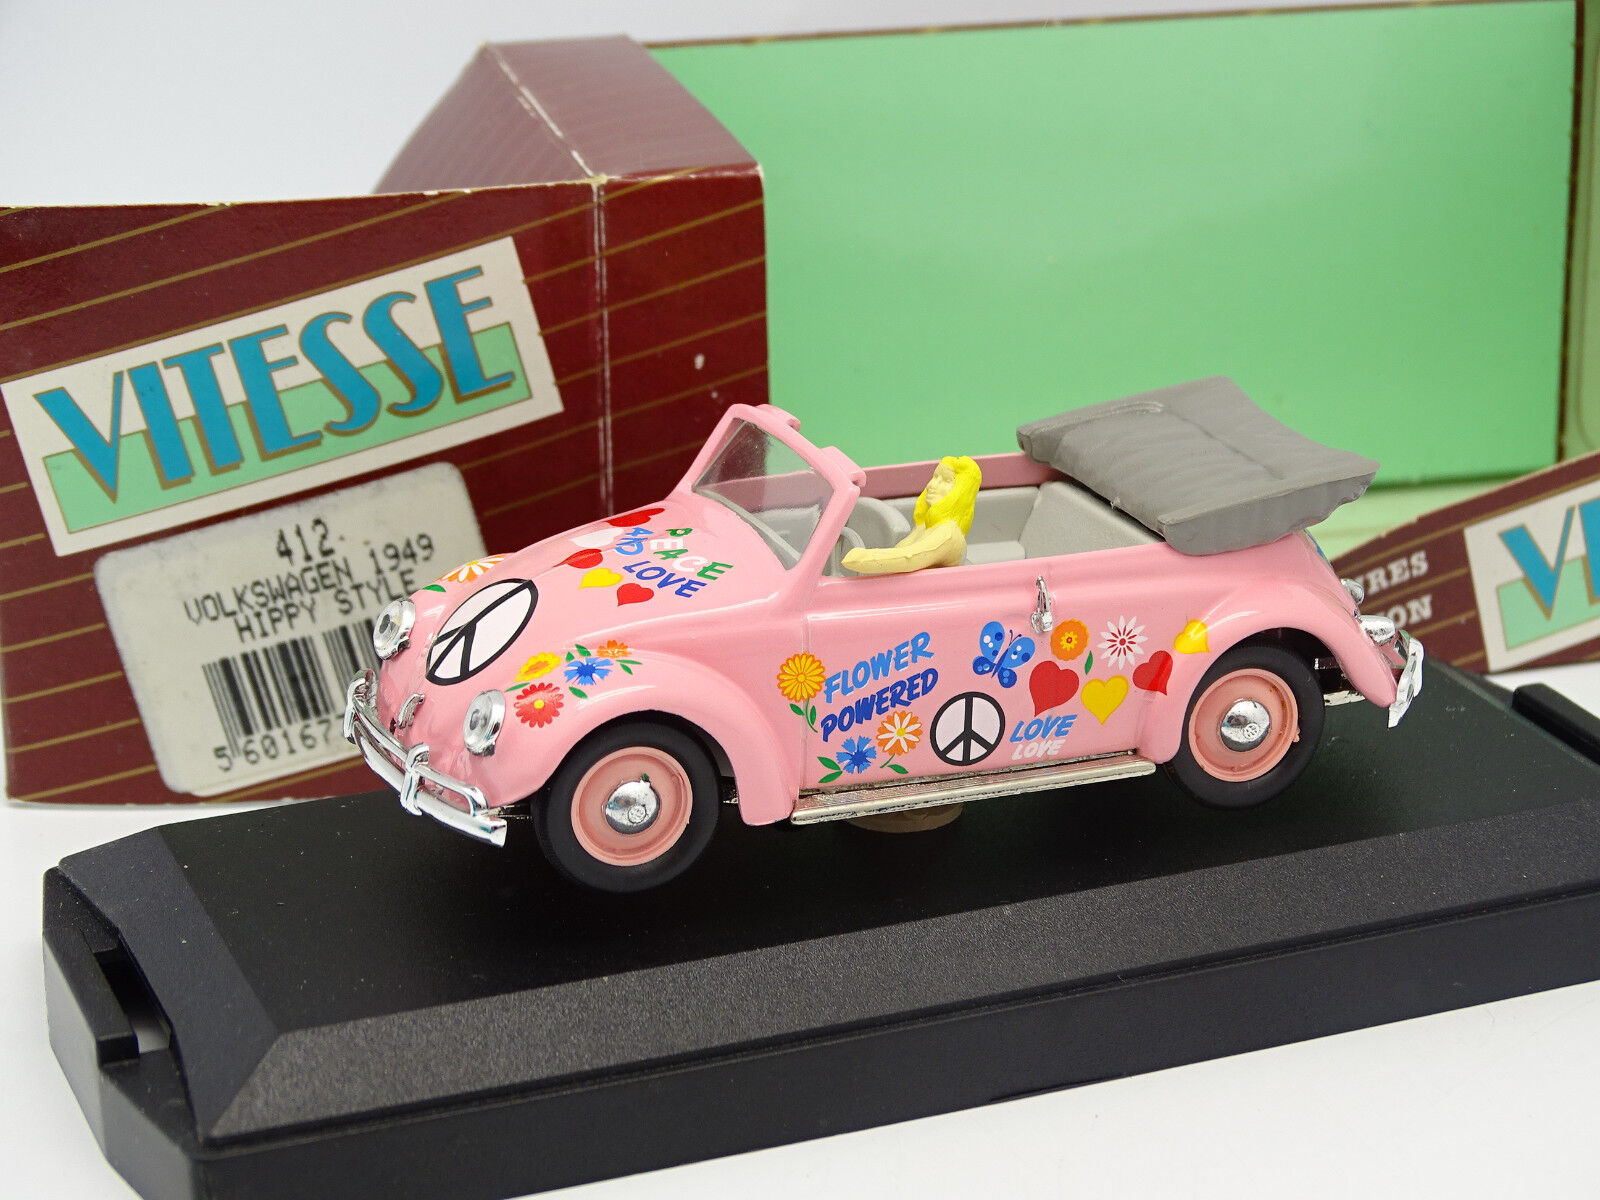 Vitesse 1 43 - VW Beetle Coccinelle Cabriolet Hippy Style 1949 V1